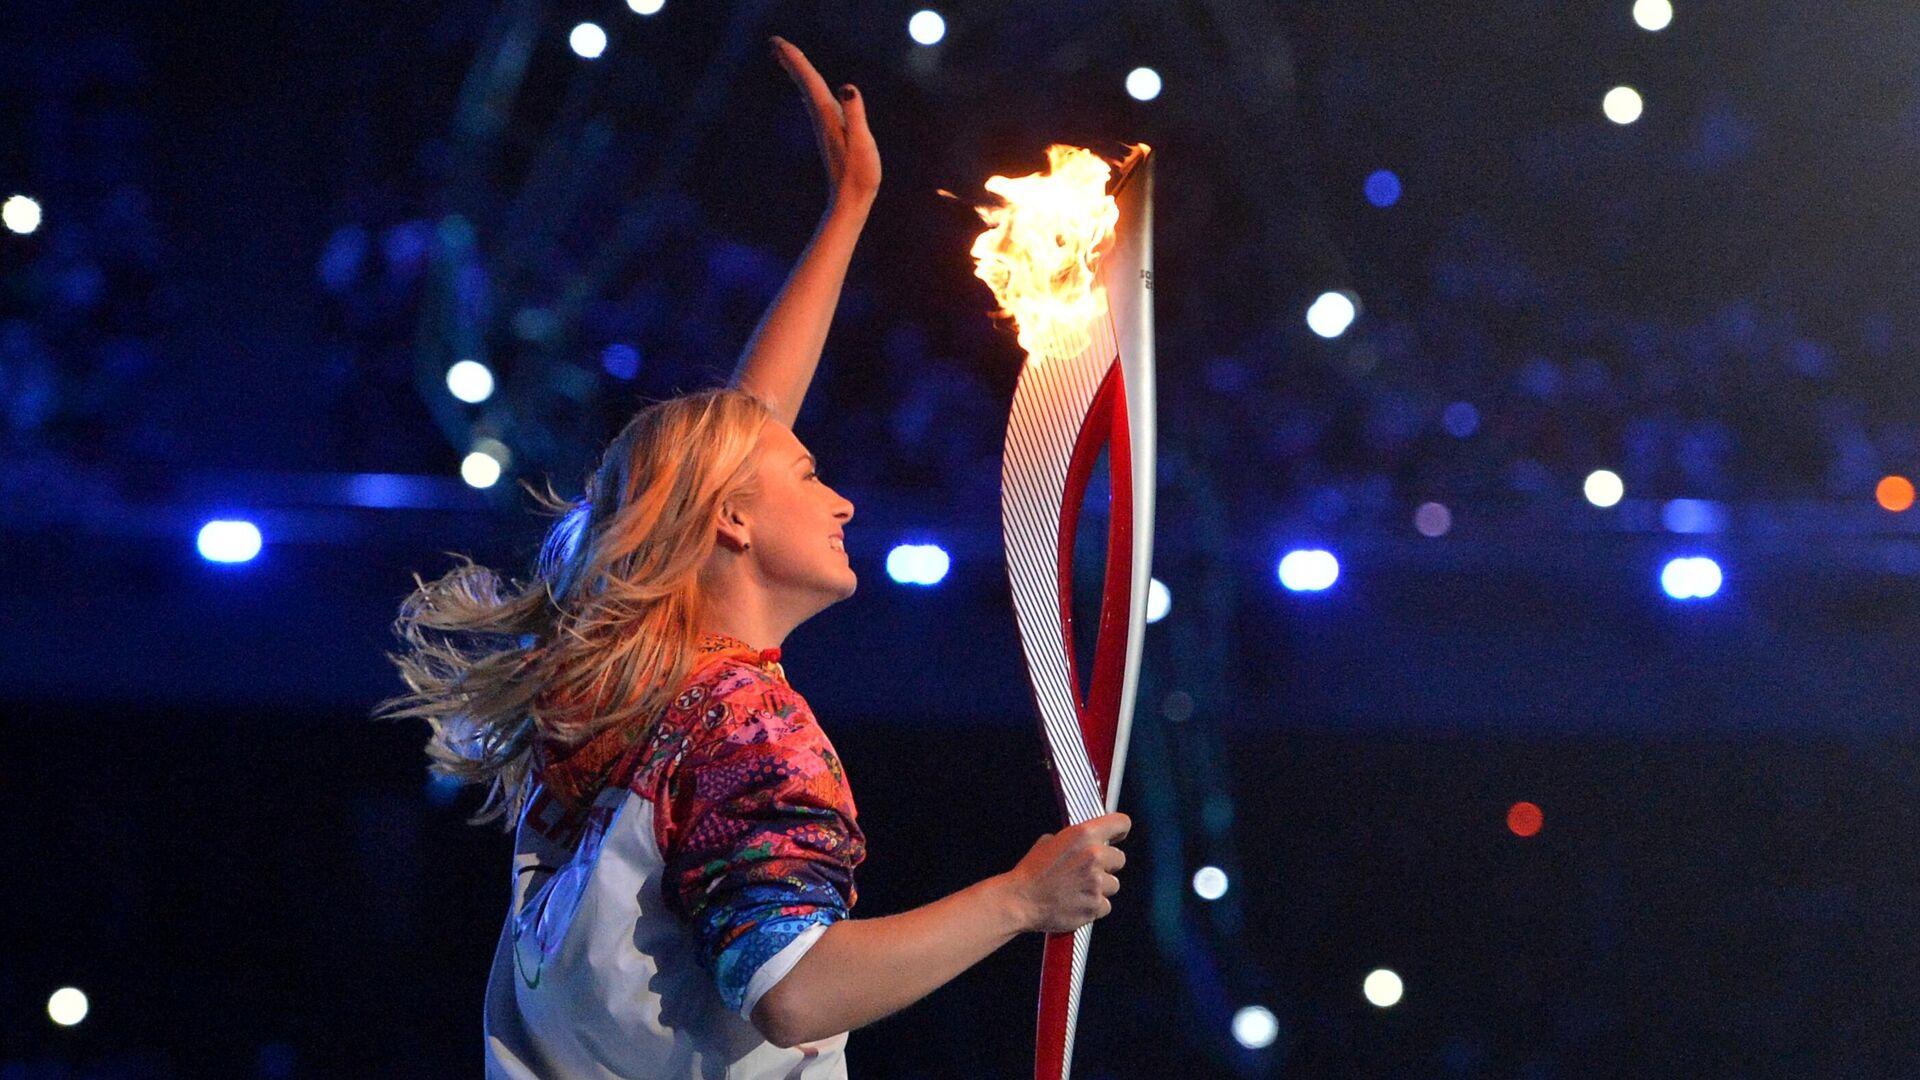 Церемония открытия XXII зимних Олимпийских игр - РИА Новости, 1920, 06.04.2021